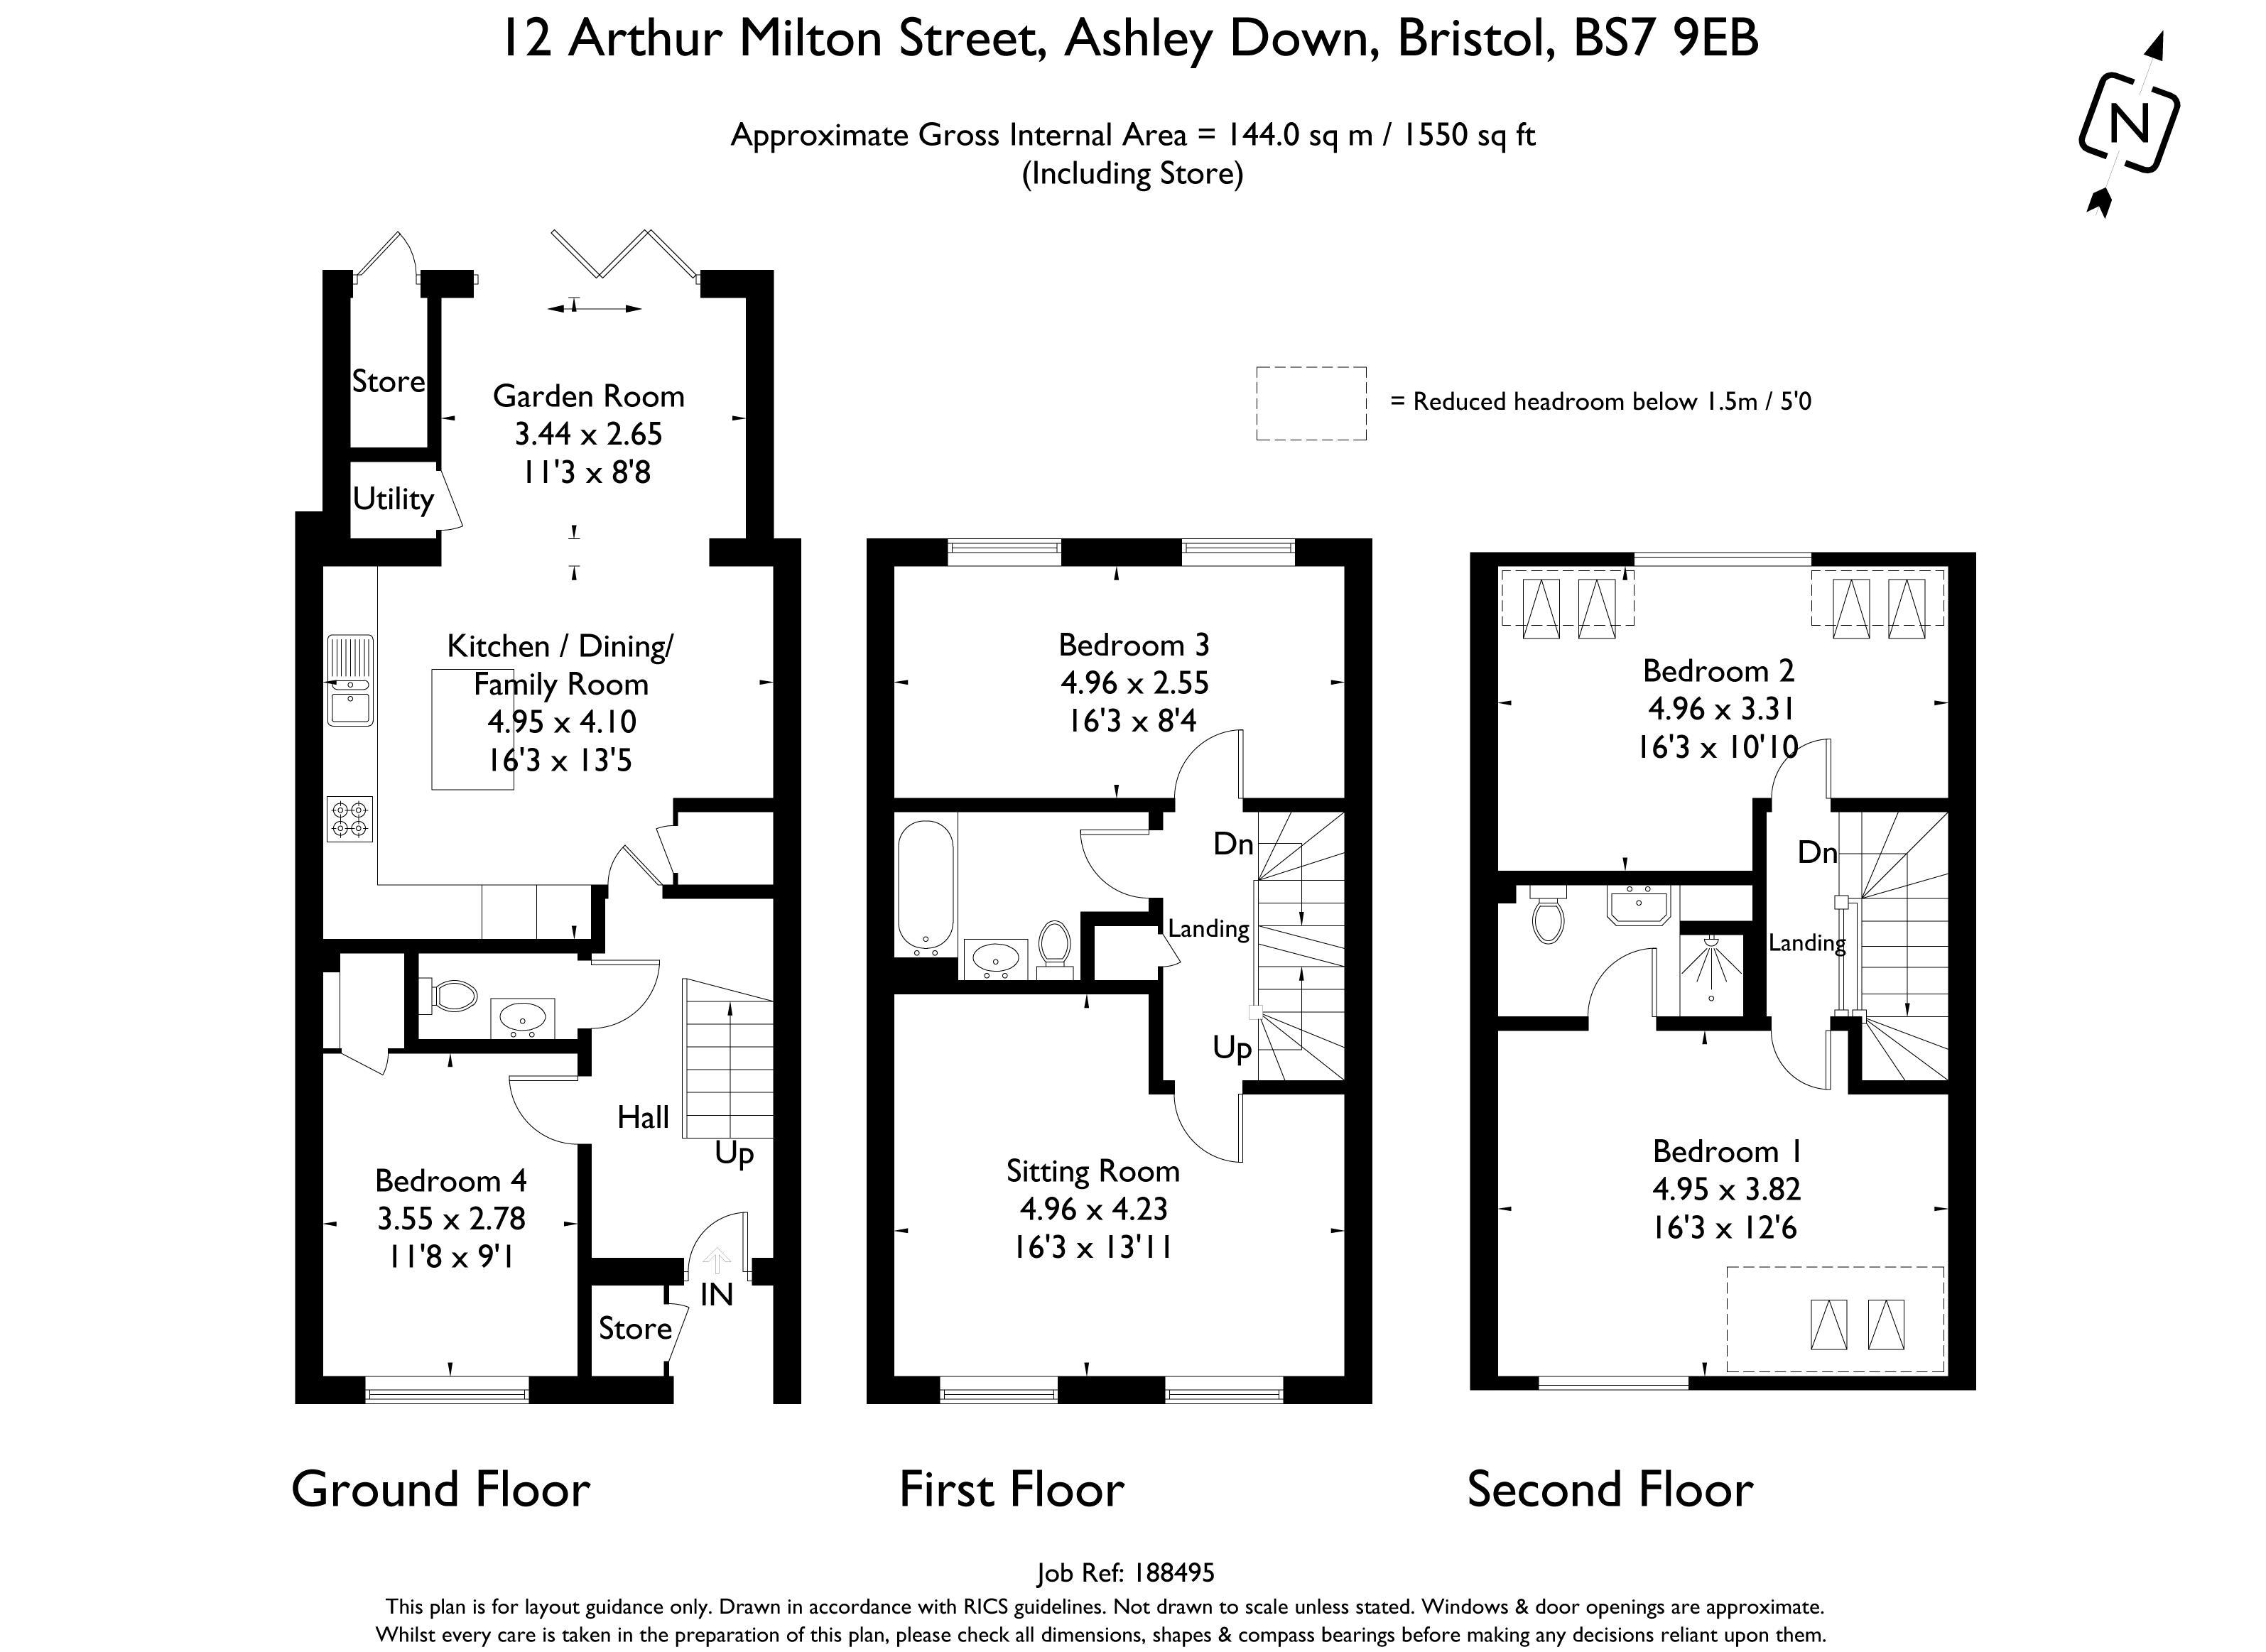 4 bedroom property for sale in arthur milton street ashley down